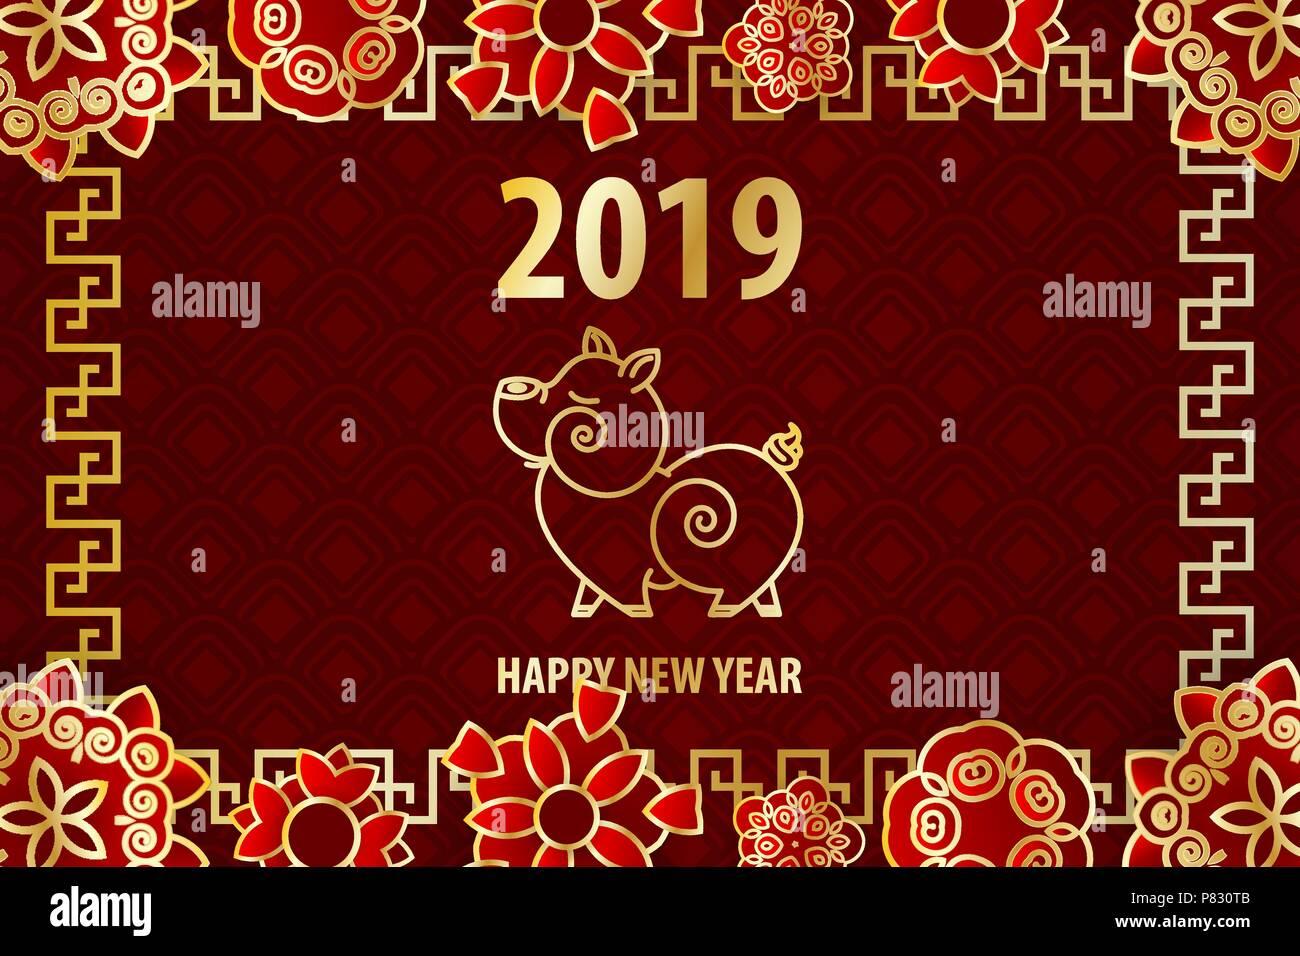 Oroscopo Cinese Maiale 2019 2019 anno nuovo cinese maiale giallo. golden telaio asiatica